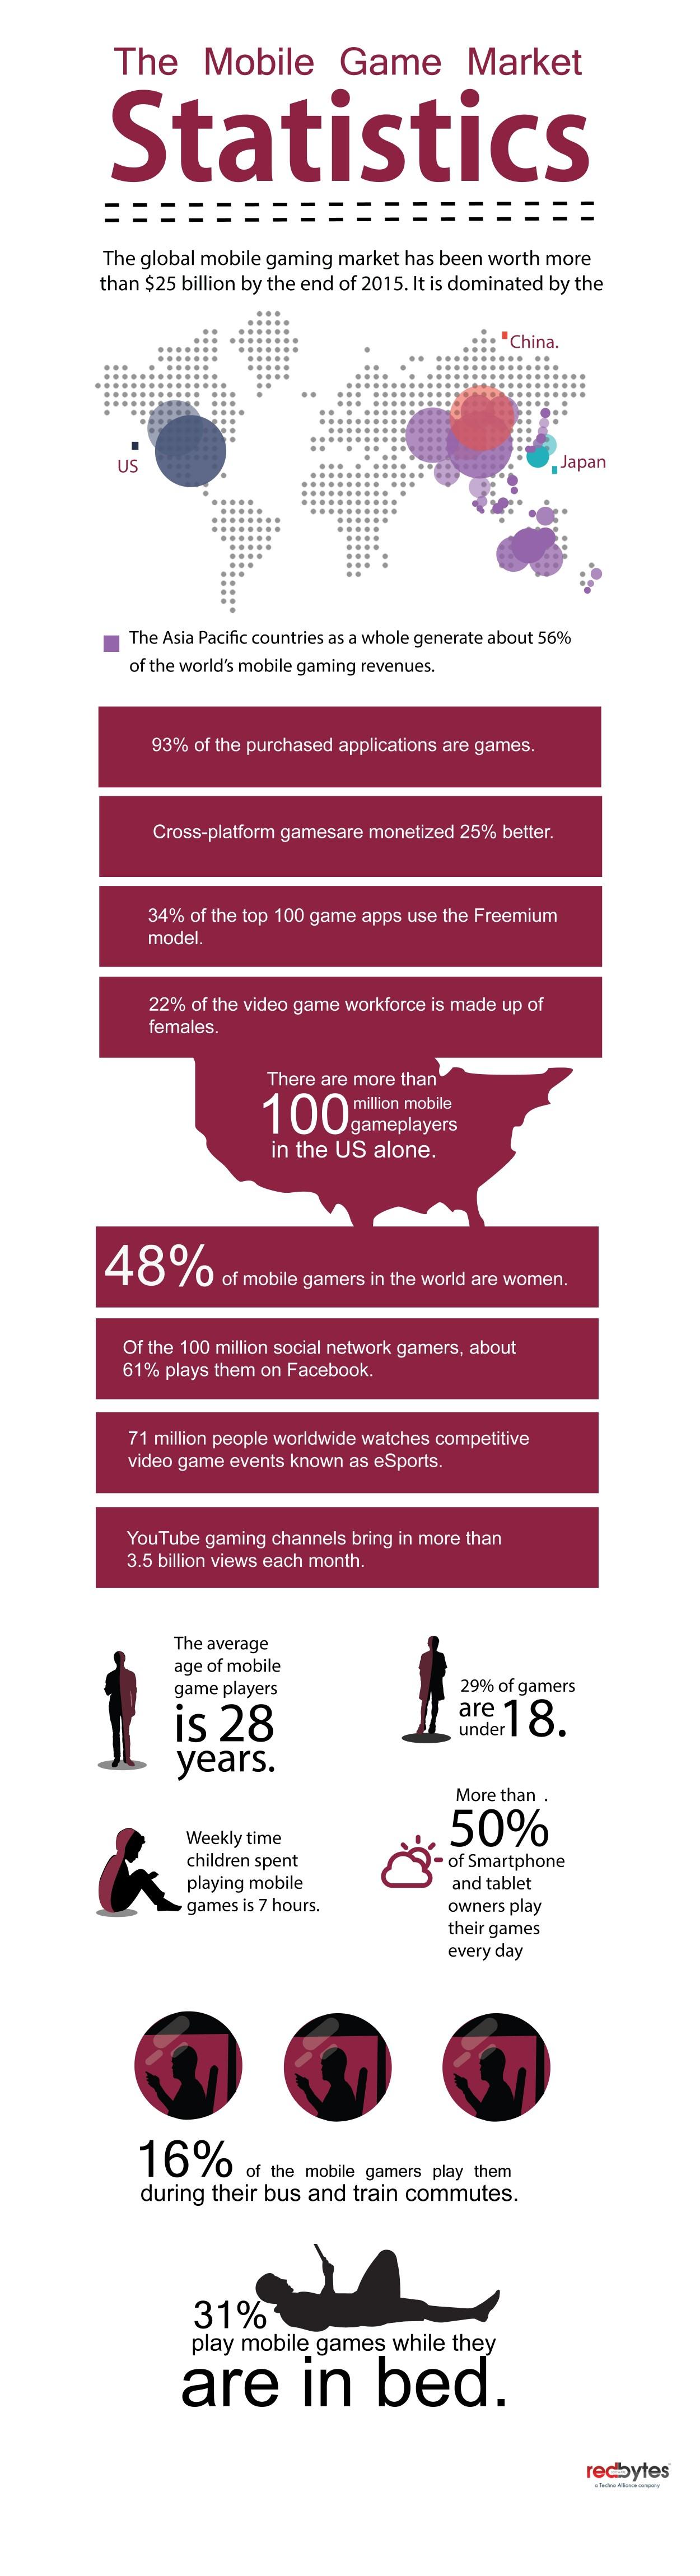 The Mobile Game Market Statistics